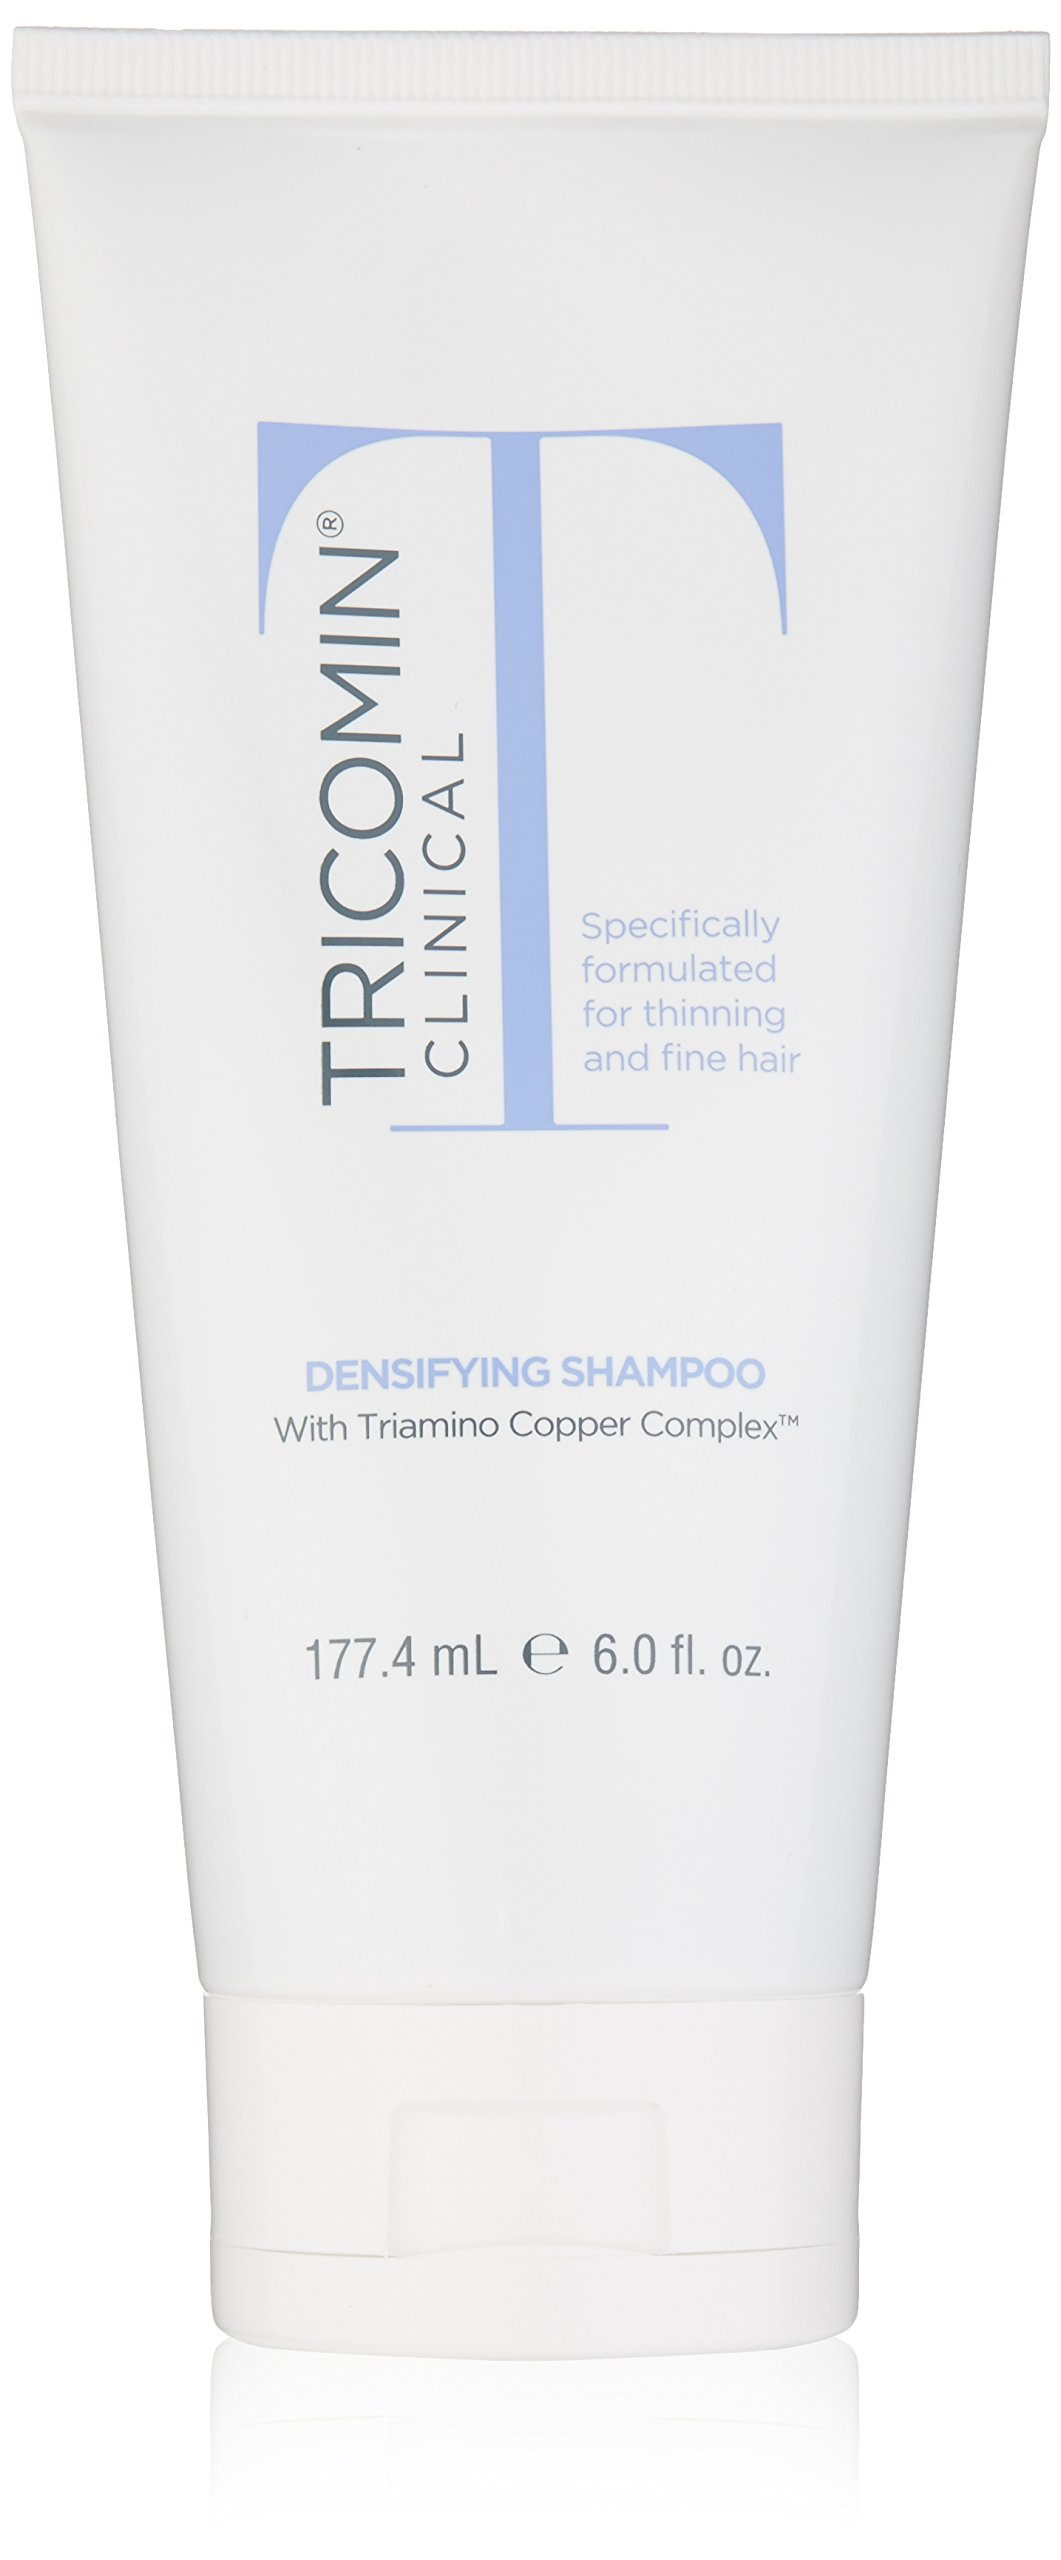 NEOVA Tricomin Densifying Shampoo, 6 Fluid Ounce by NEOVA